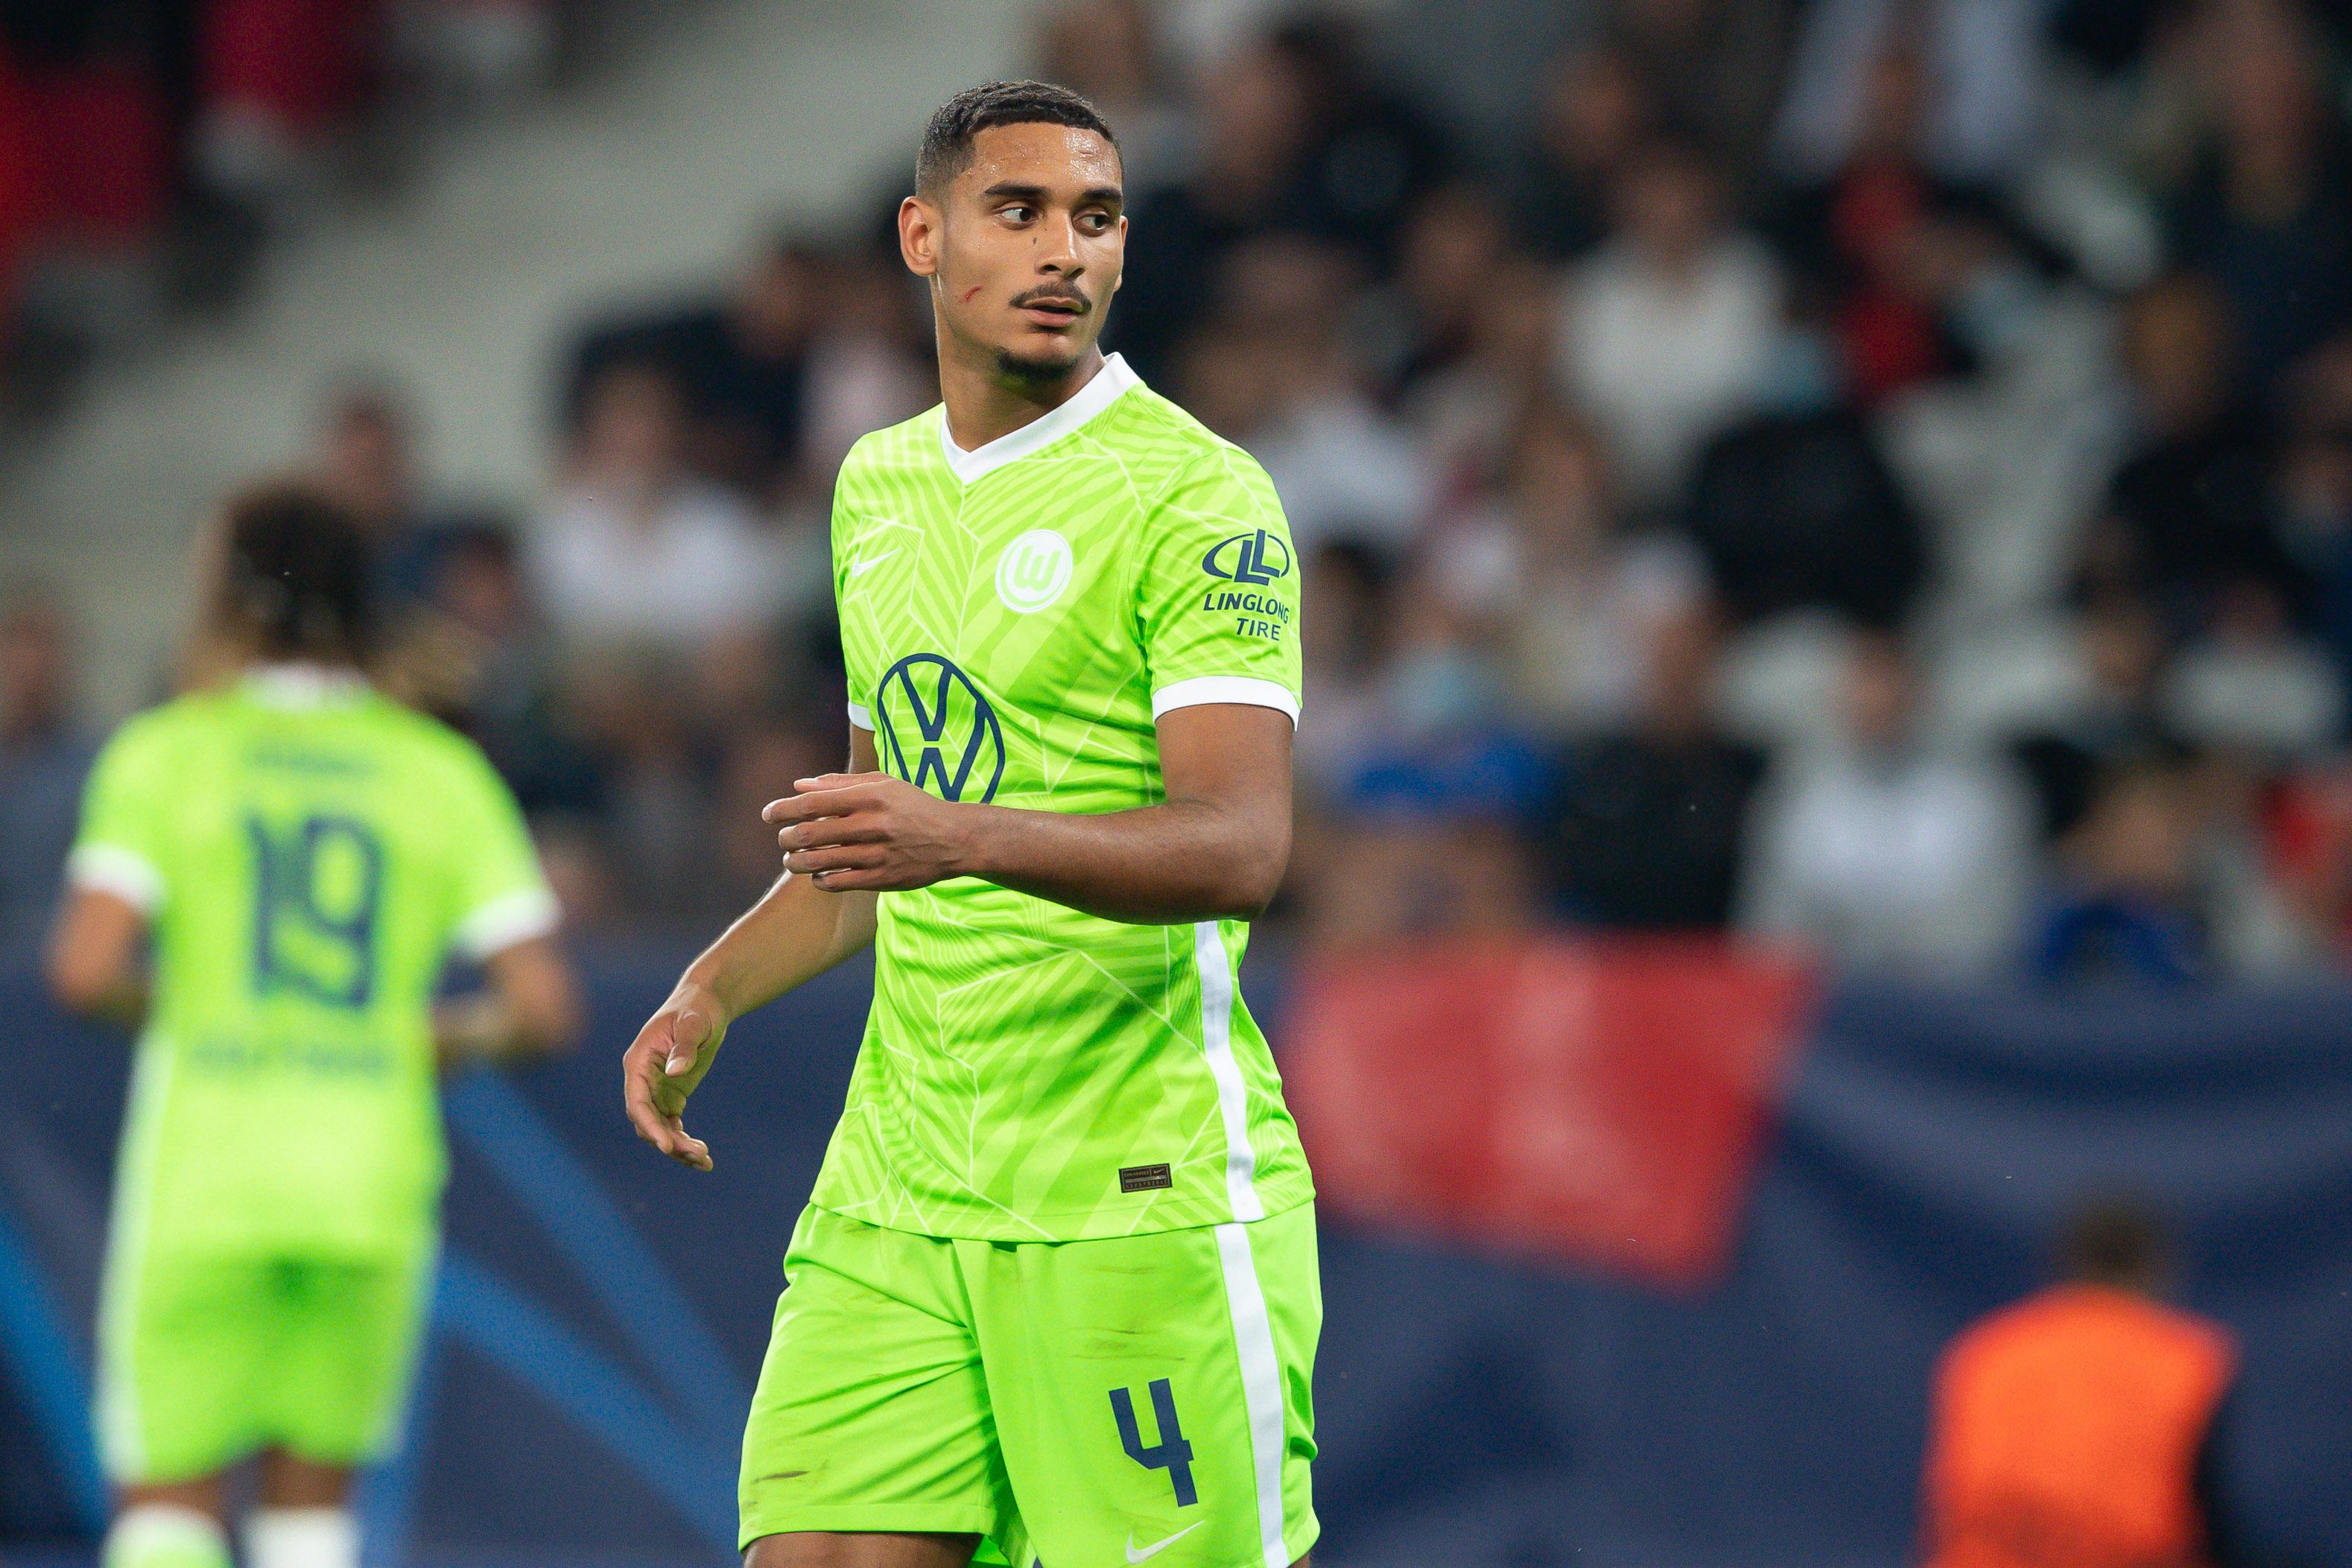 Lille OSC v VfL Wolfsburg - Group G - UEFA Champions League